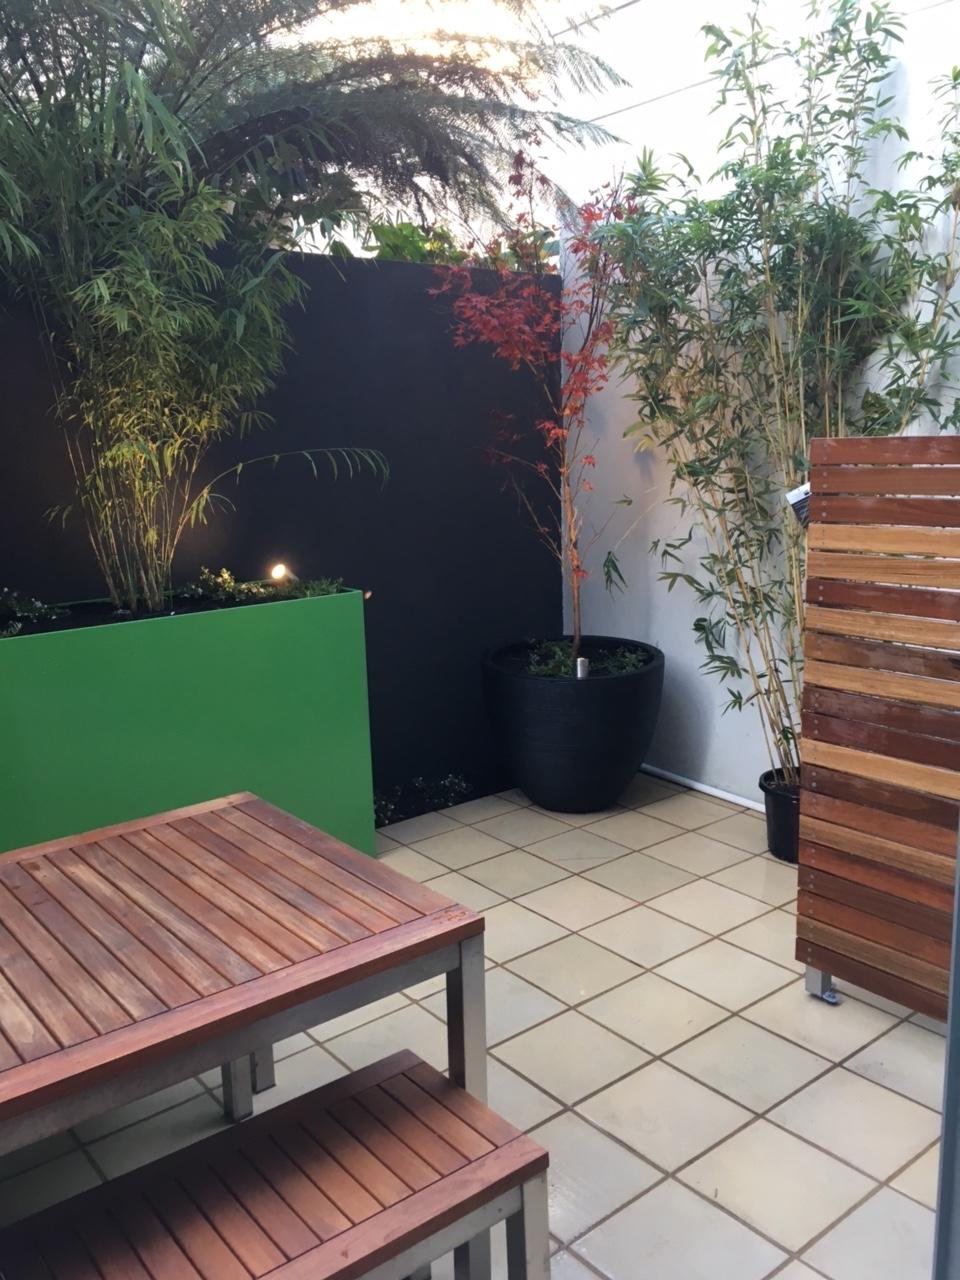 new courtyard in Melbourne - Small Spaces Garden Design